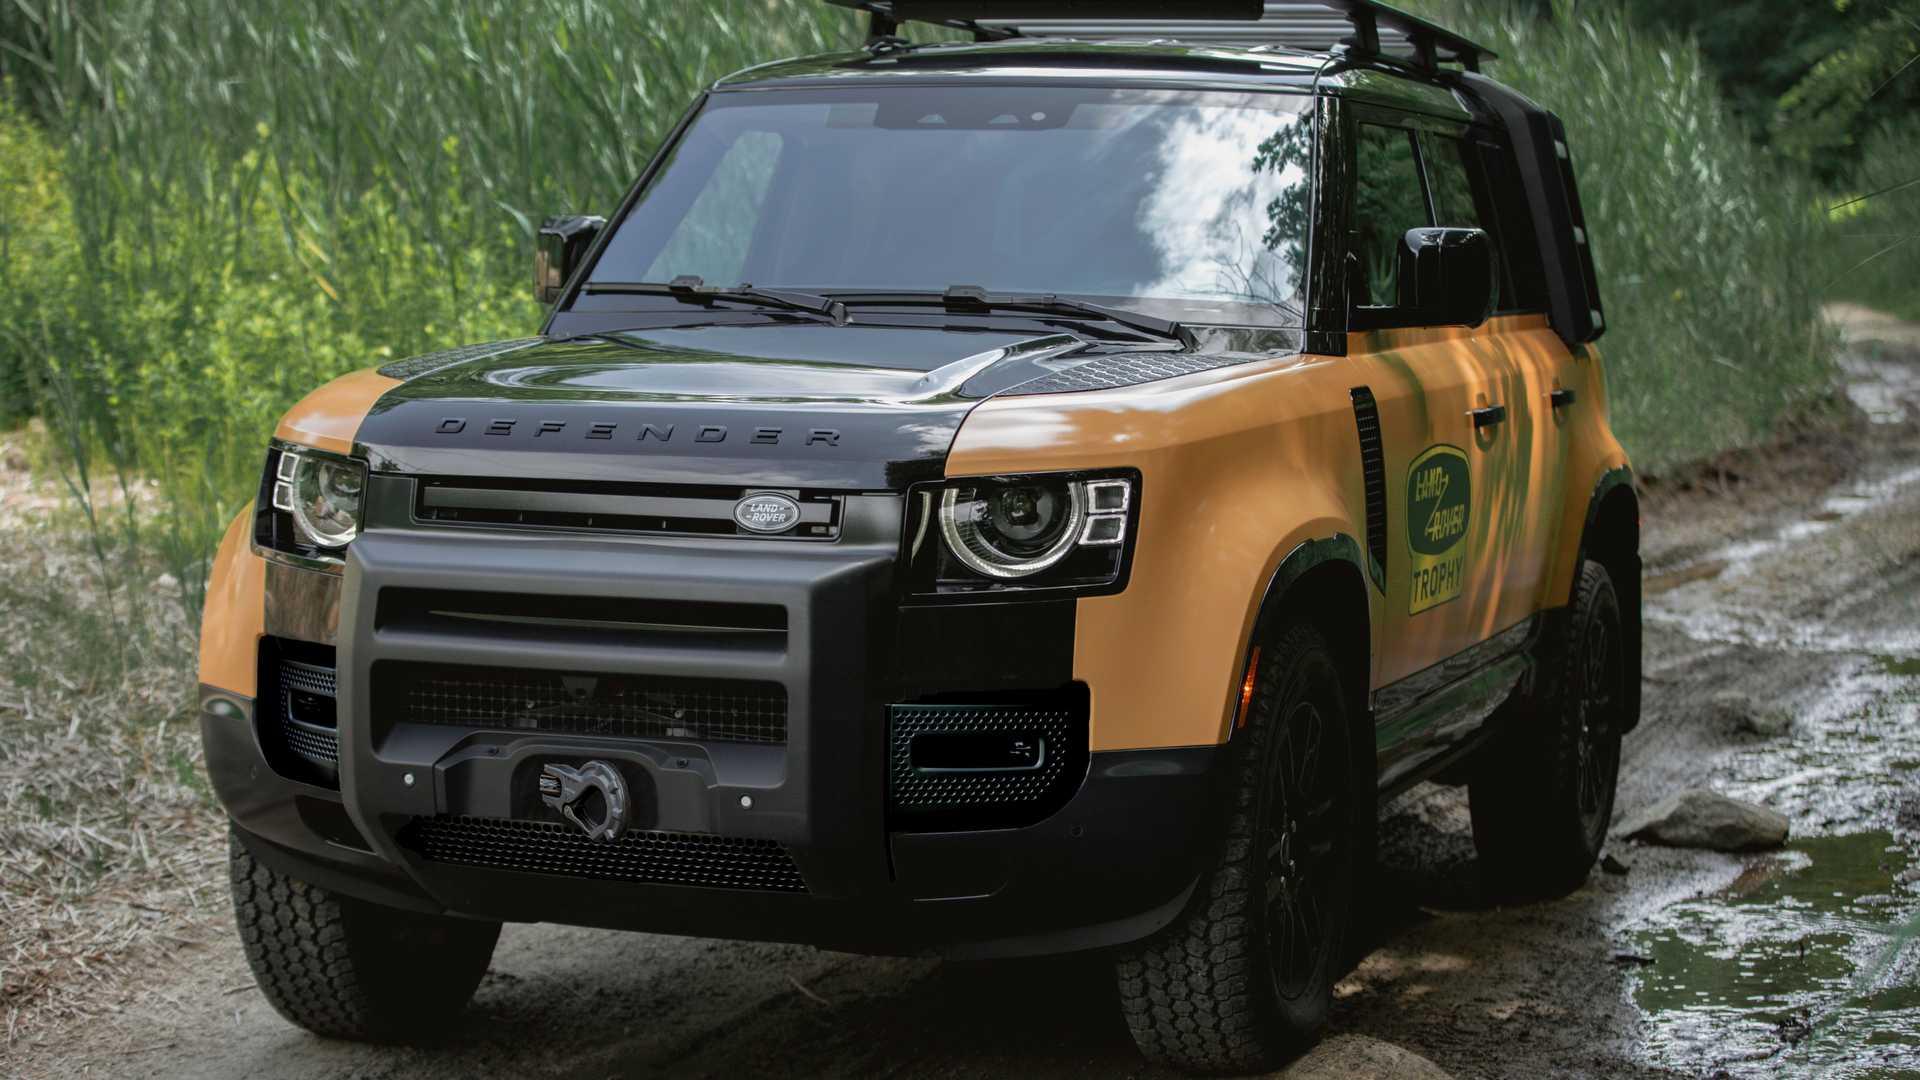 Land-Rover-Defender-Trophy-Edition-5